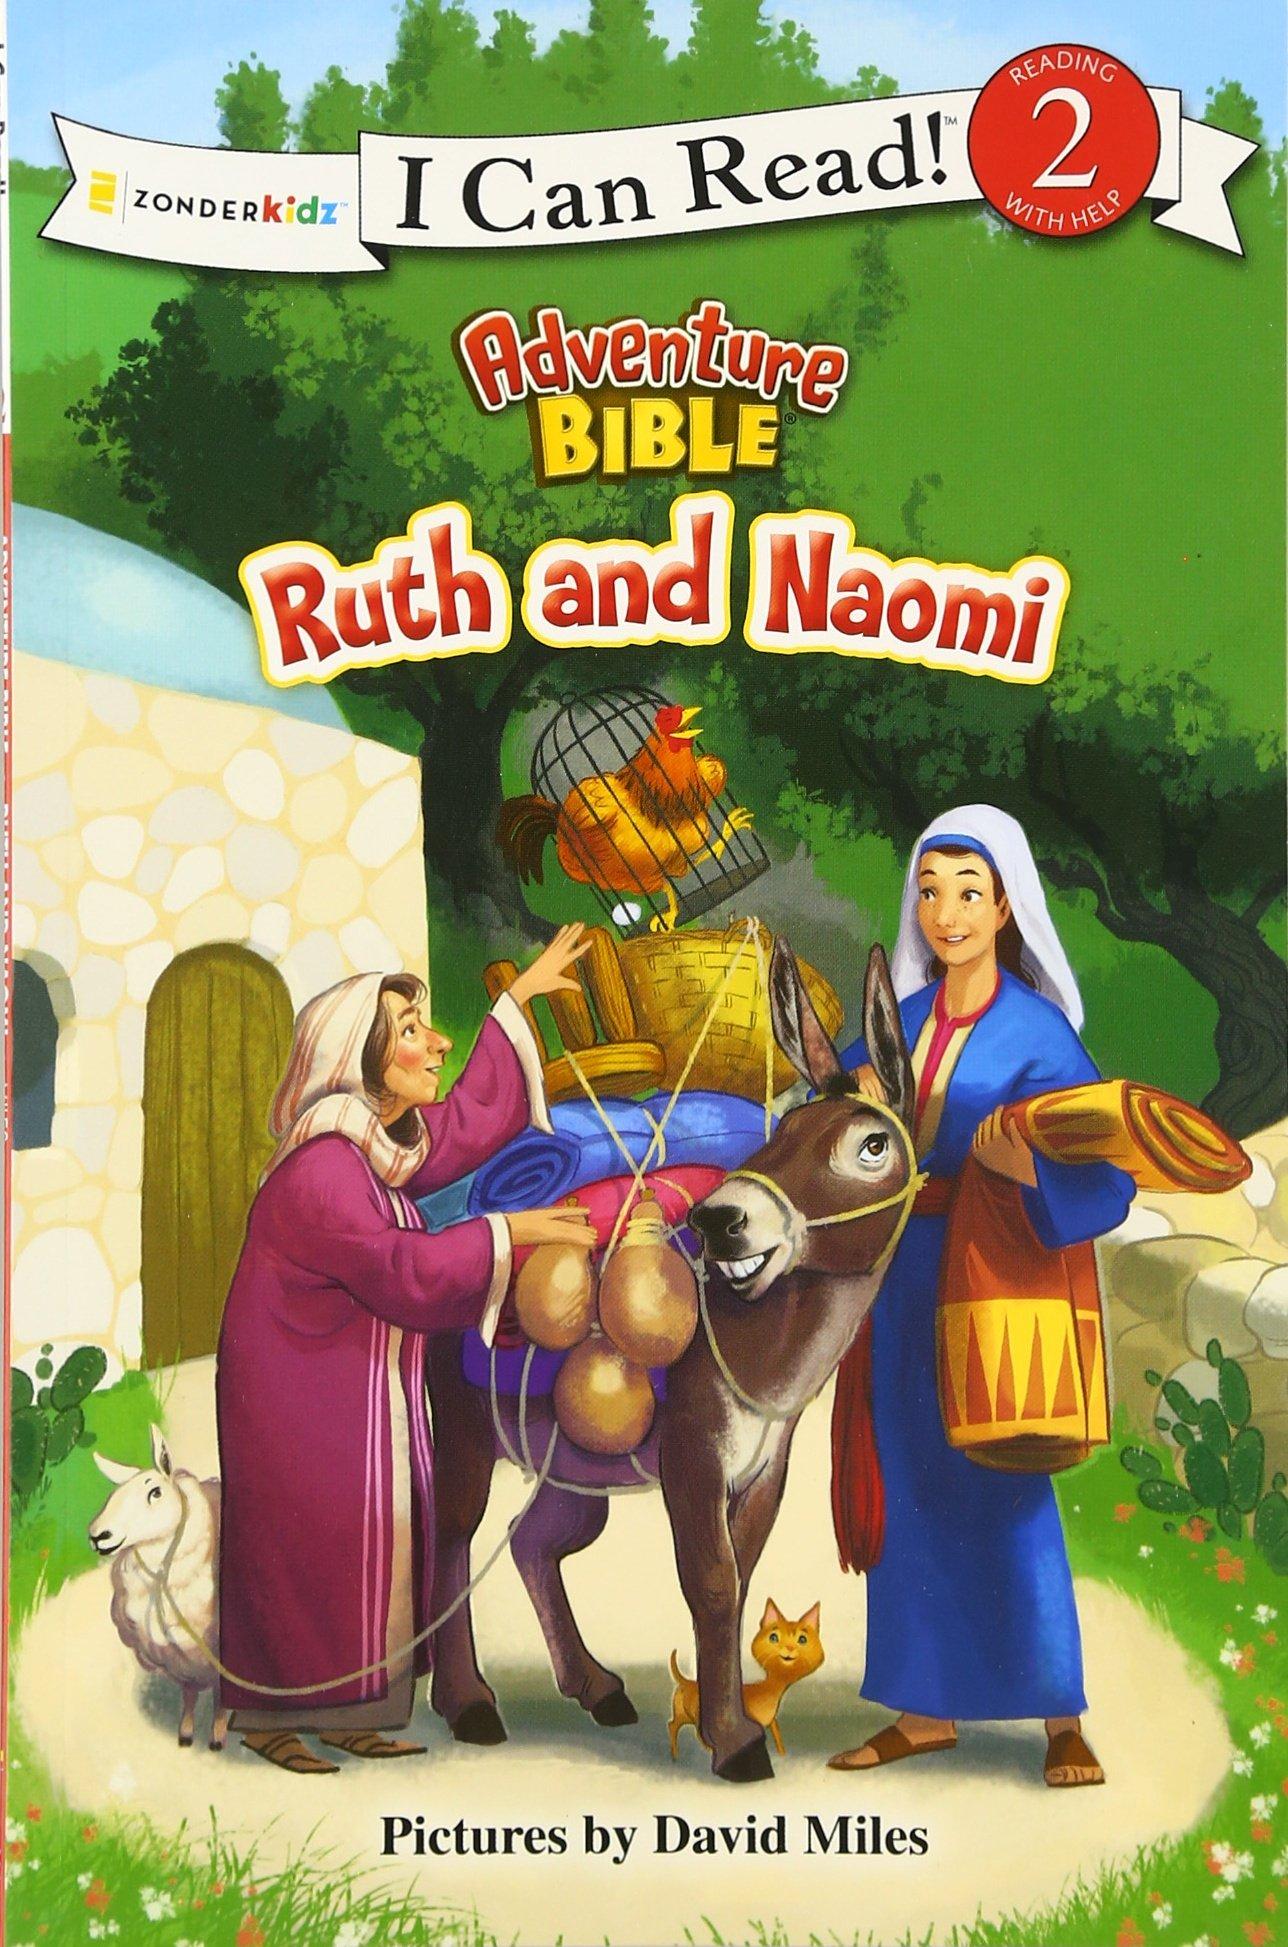 amazon com ruth and naomi i can read adventure bible